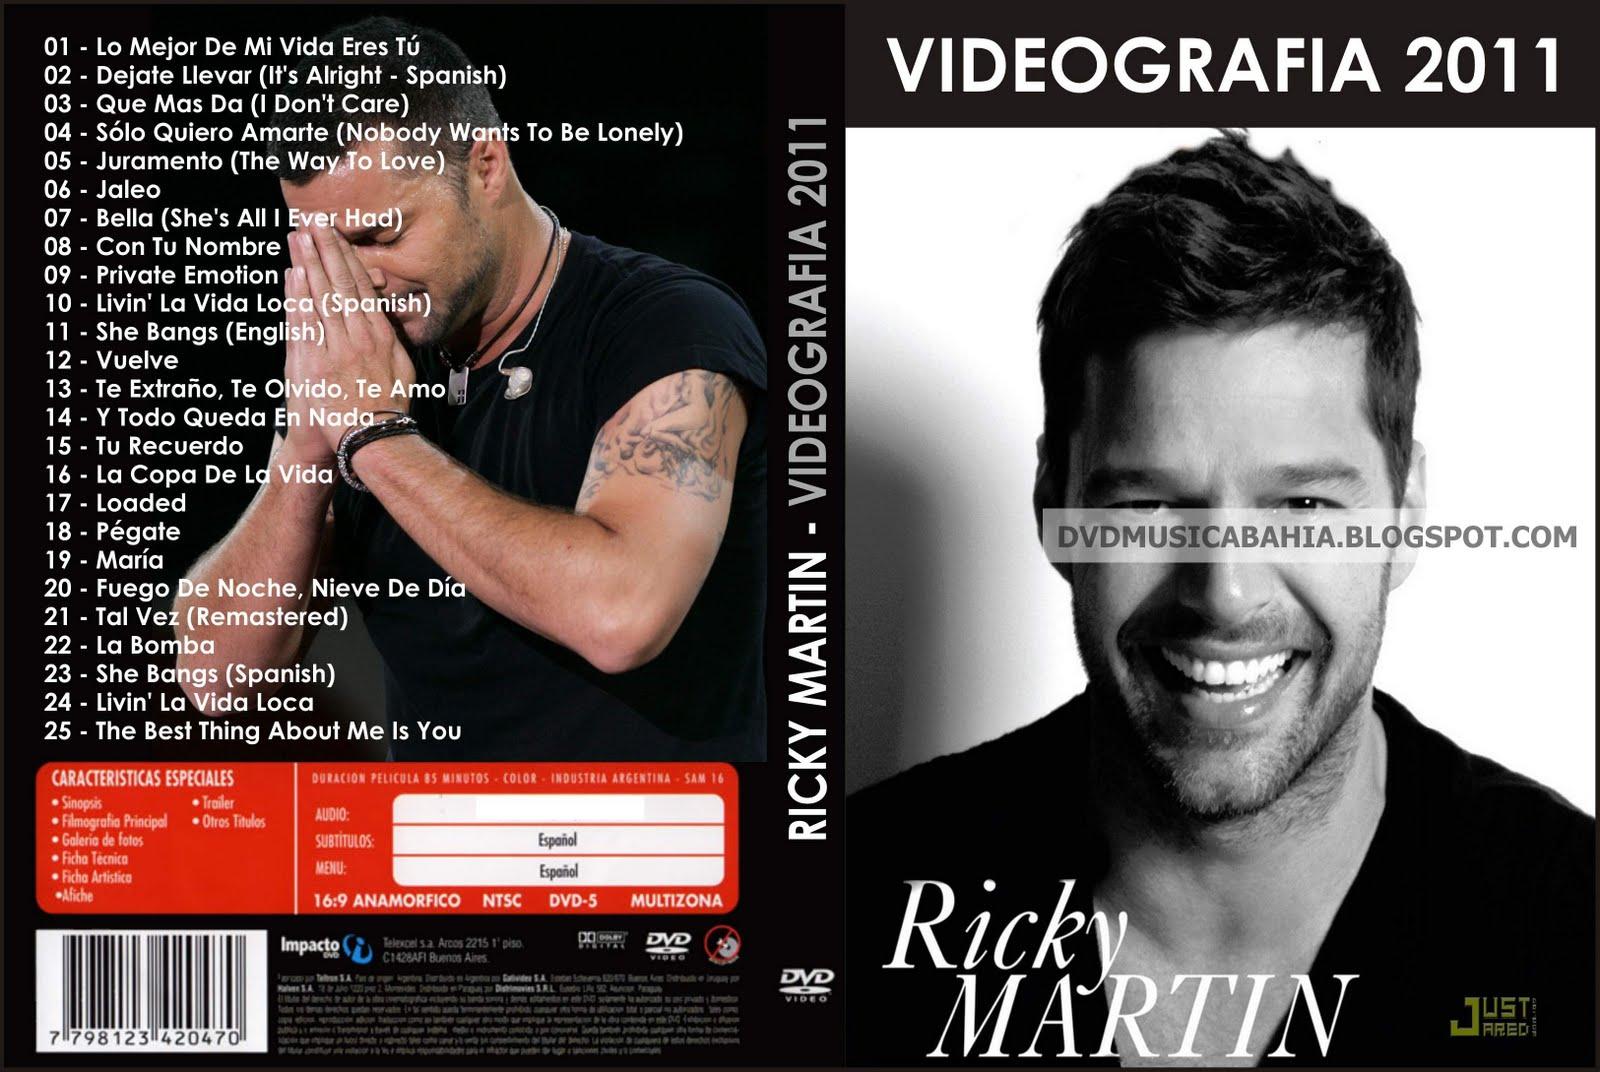 http://1.bp.blogspot.com/-oqziI5FvYUg/TksWEzvmDaI/AAAAAAAABuw/bH_6wAtXlTE/s1600/Ricky+Martin+-+Videografia+%255B2011%255D.jpg